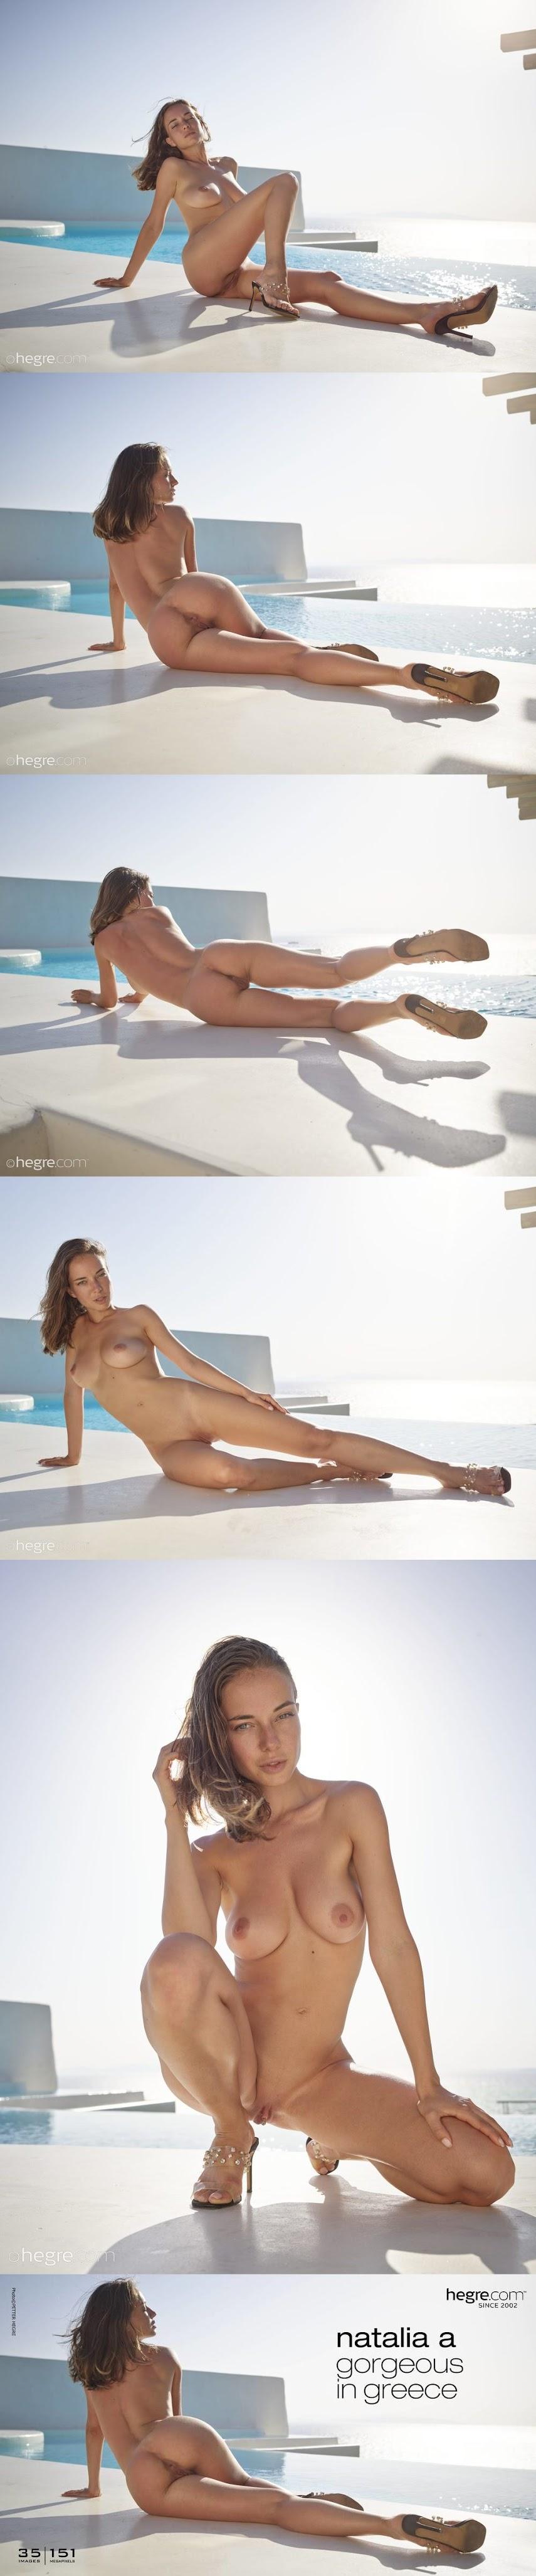 [Art] Natalia A - Gorgeous In Greece